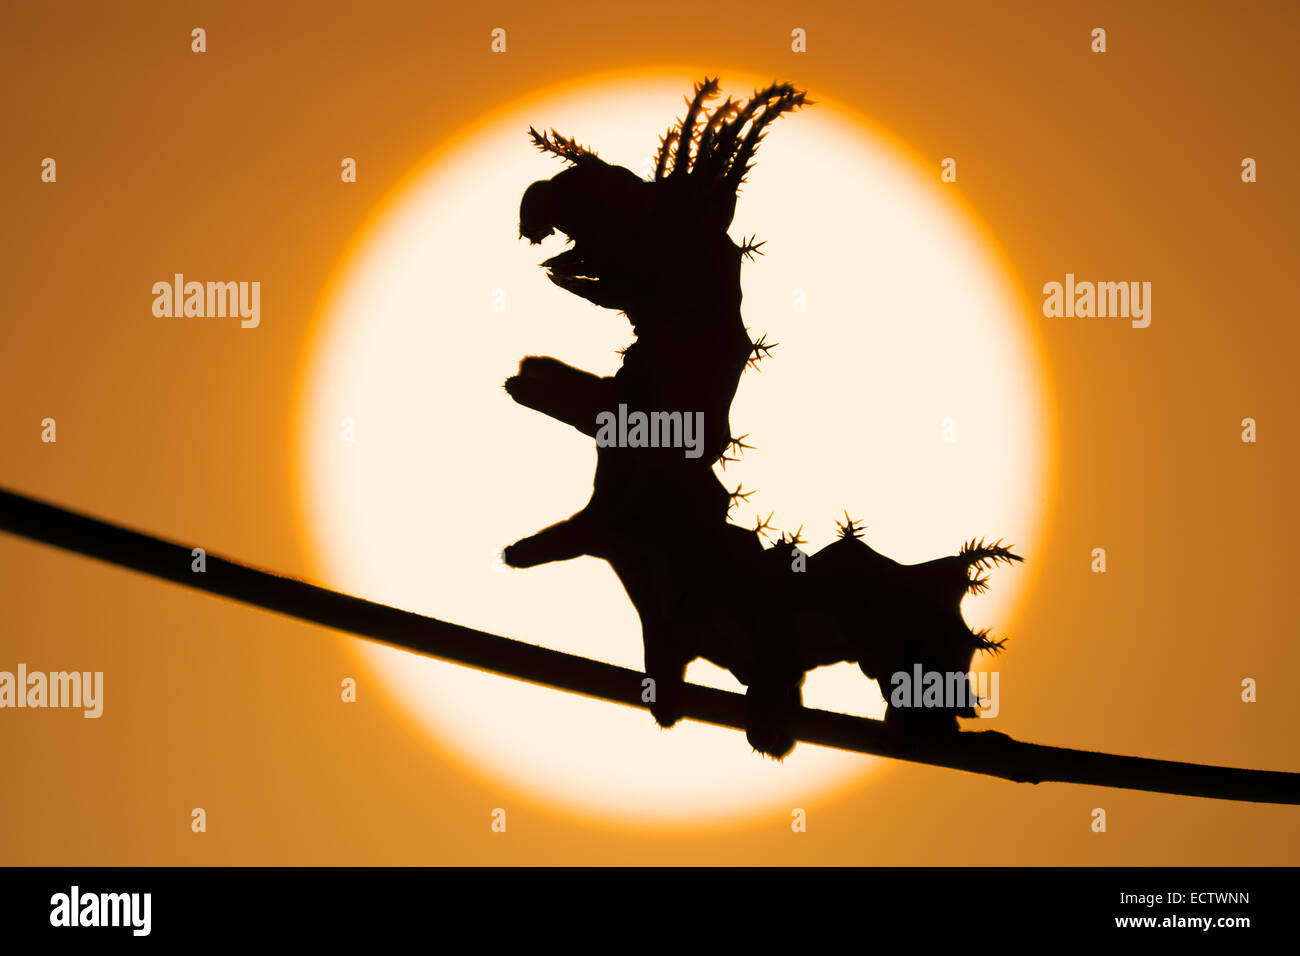 Regal Moth aka HIckory Horned Devil aka Royal Walnut moth, 3rd instar larva silhouetted against the sunrise. - Stock Image